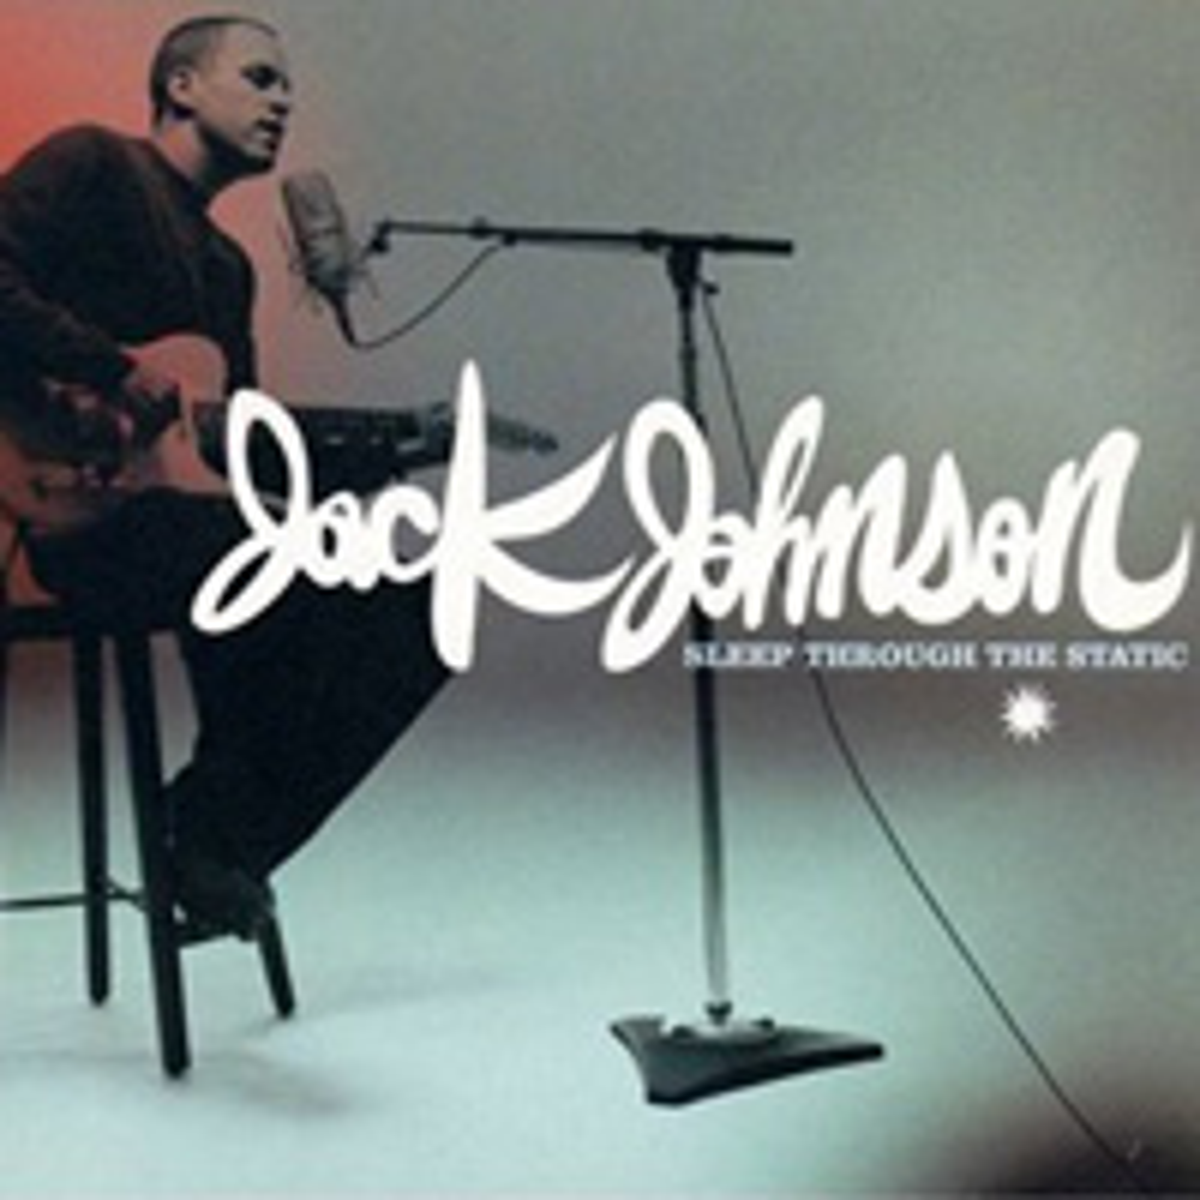 Jack Johnson, Sleep Through the Static